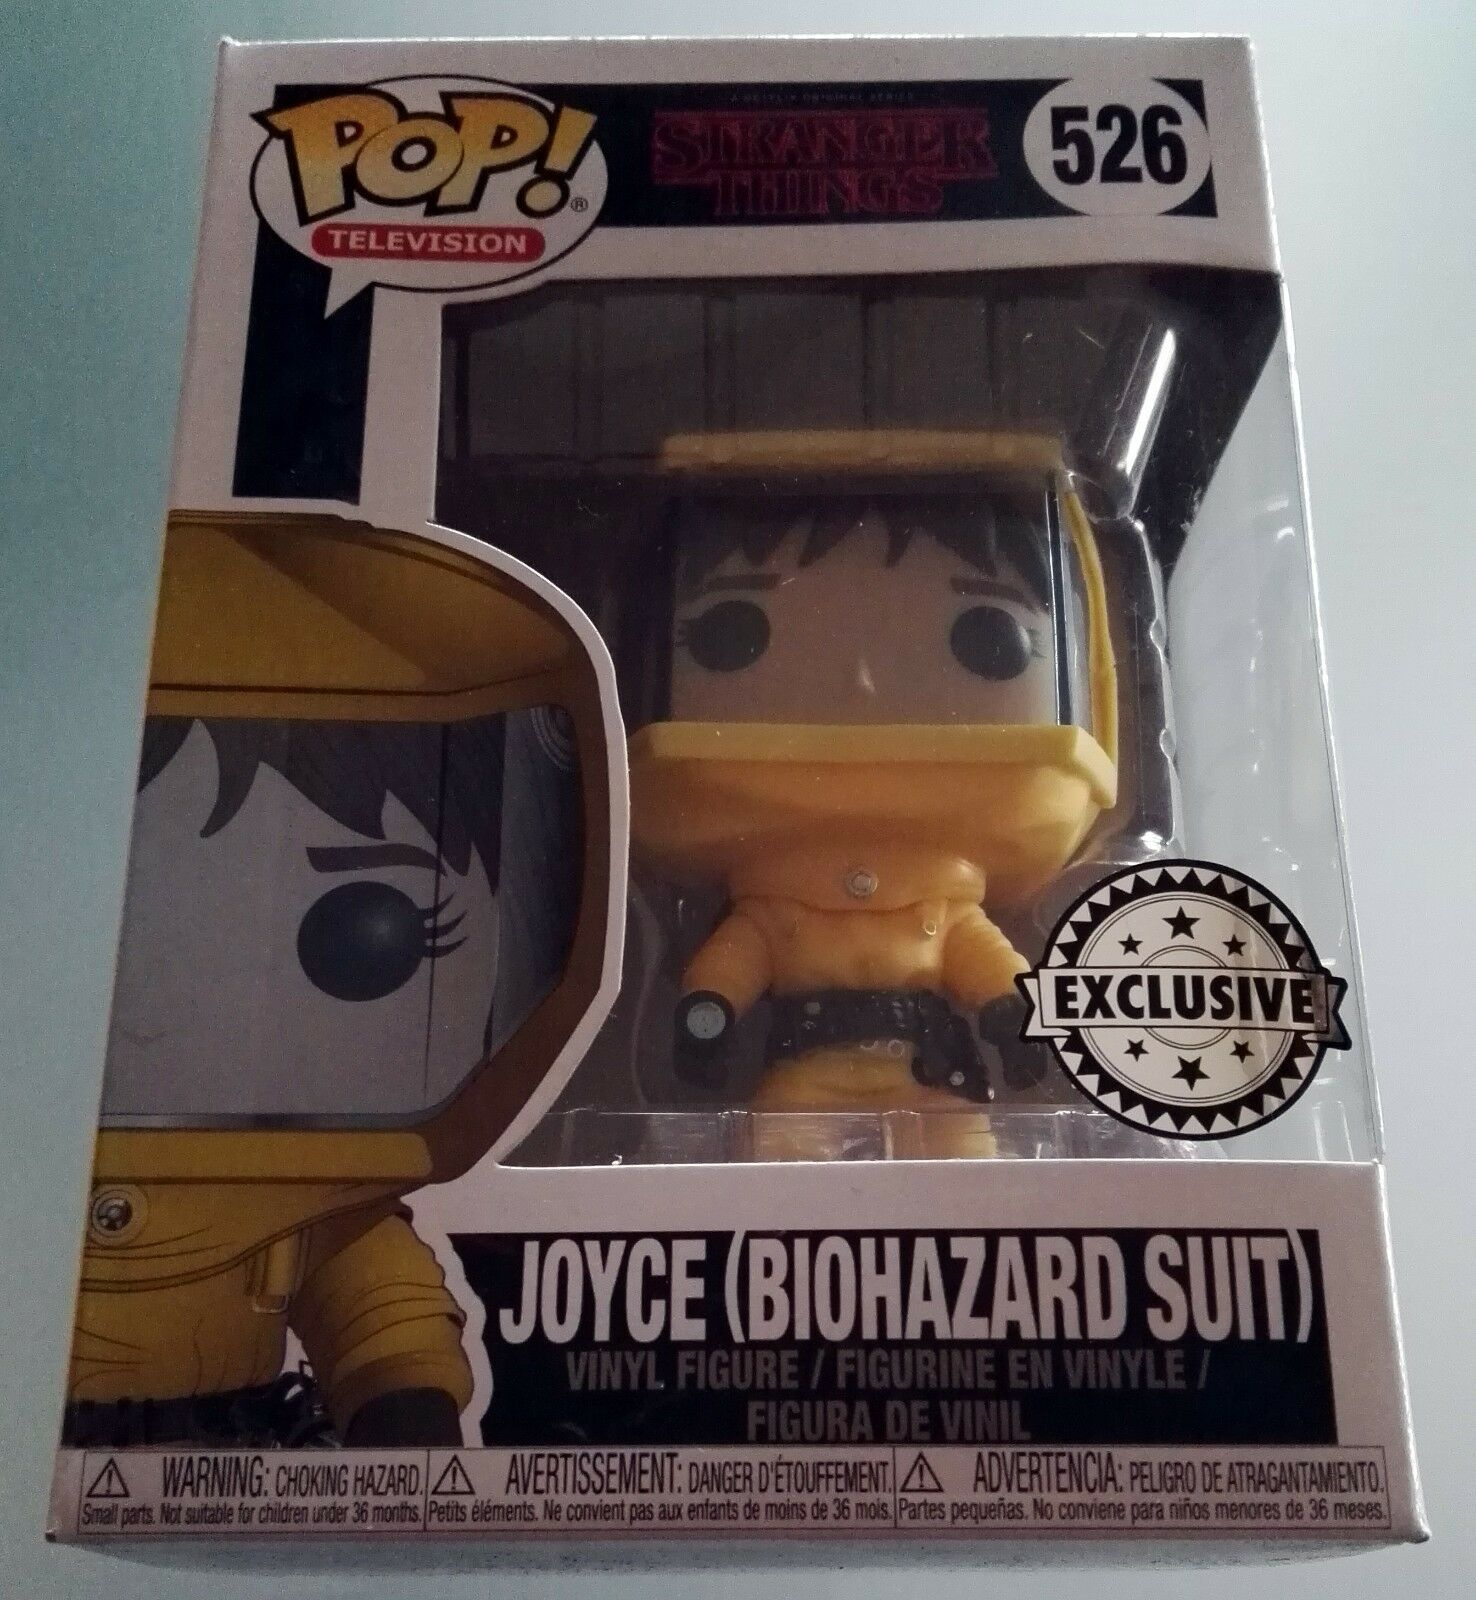 Joyce Biohazard Suite Stranger Things Exclusive Funko Pop Figure Serie Tv